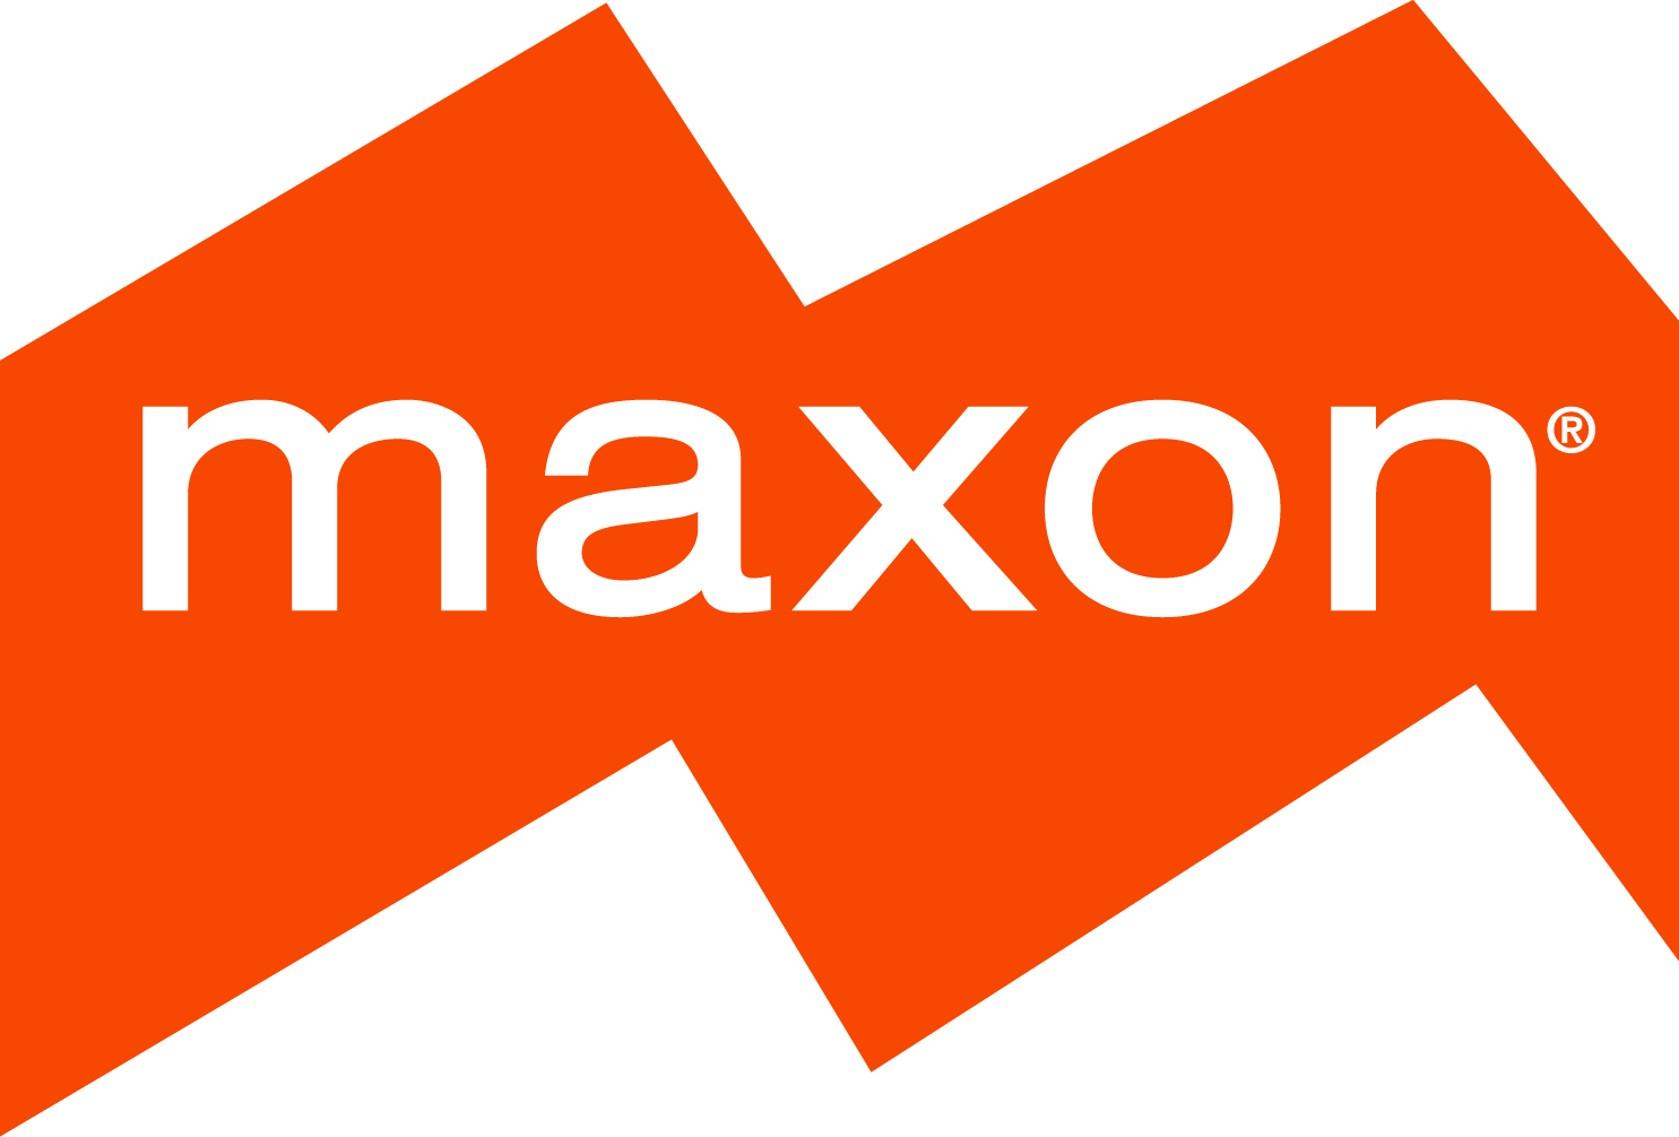 Maxon-Orange